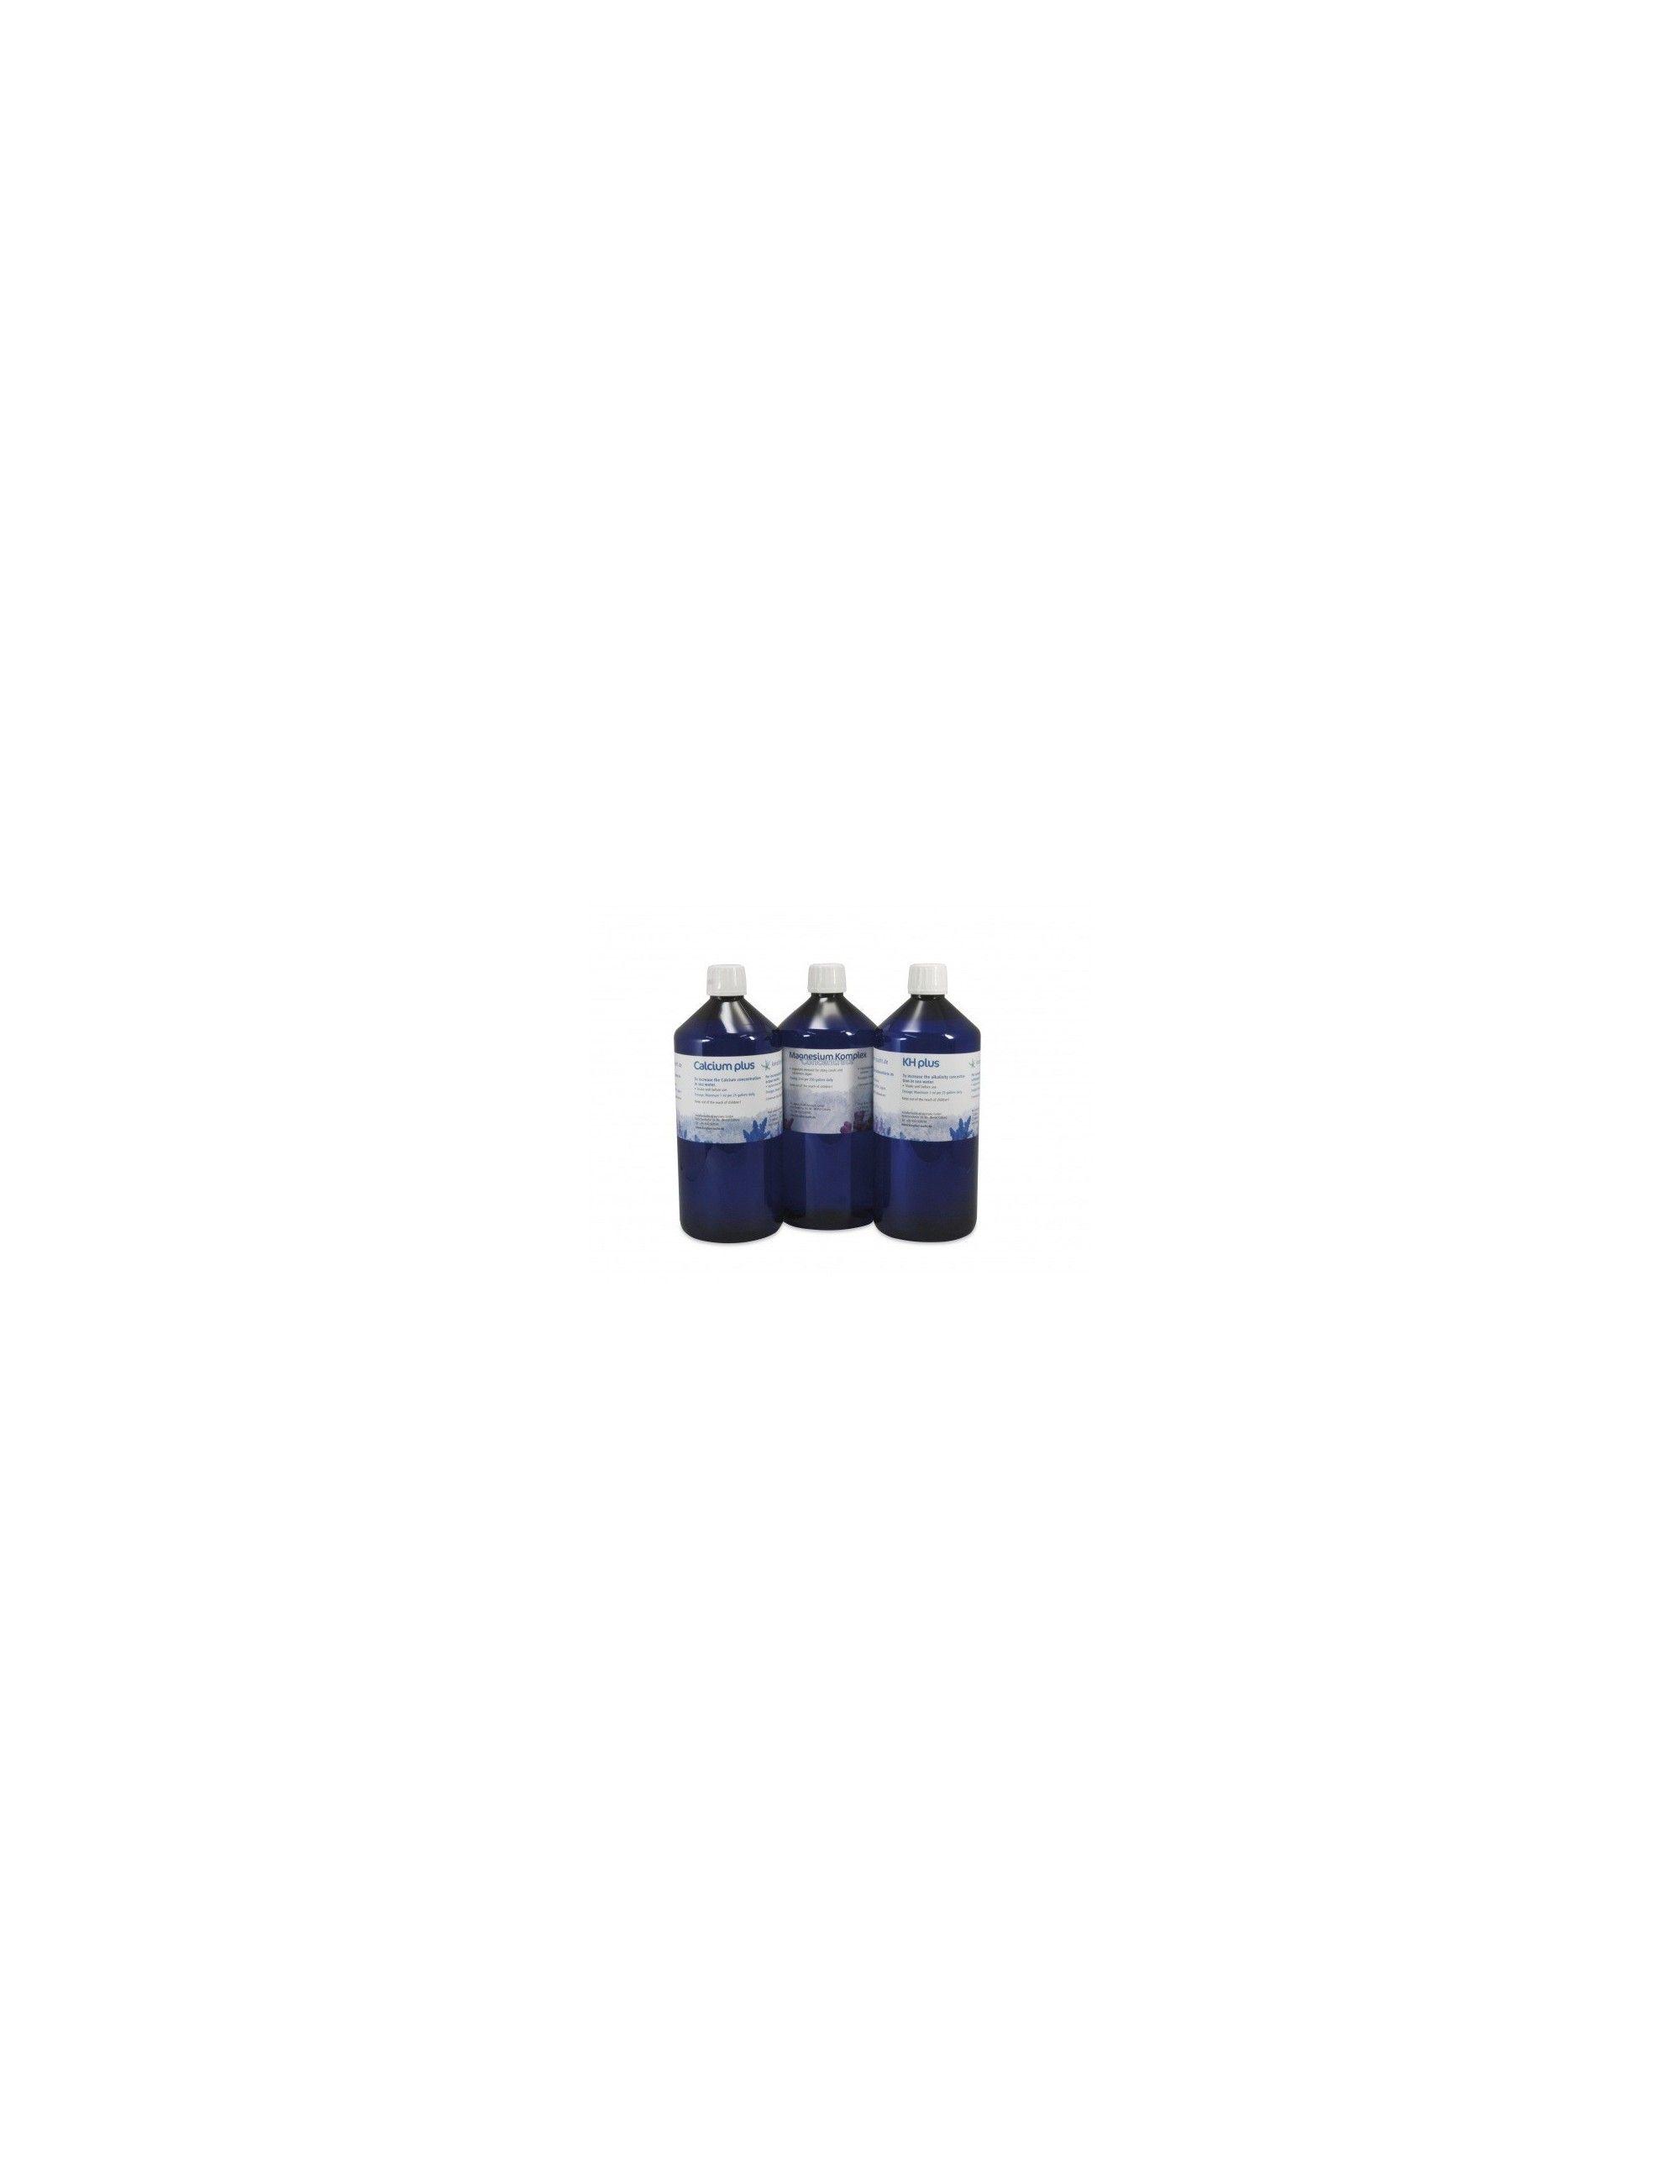 KORALLEN-ZUCHT Magnésium Complexe Concentré 500ml